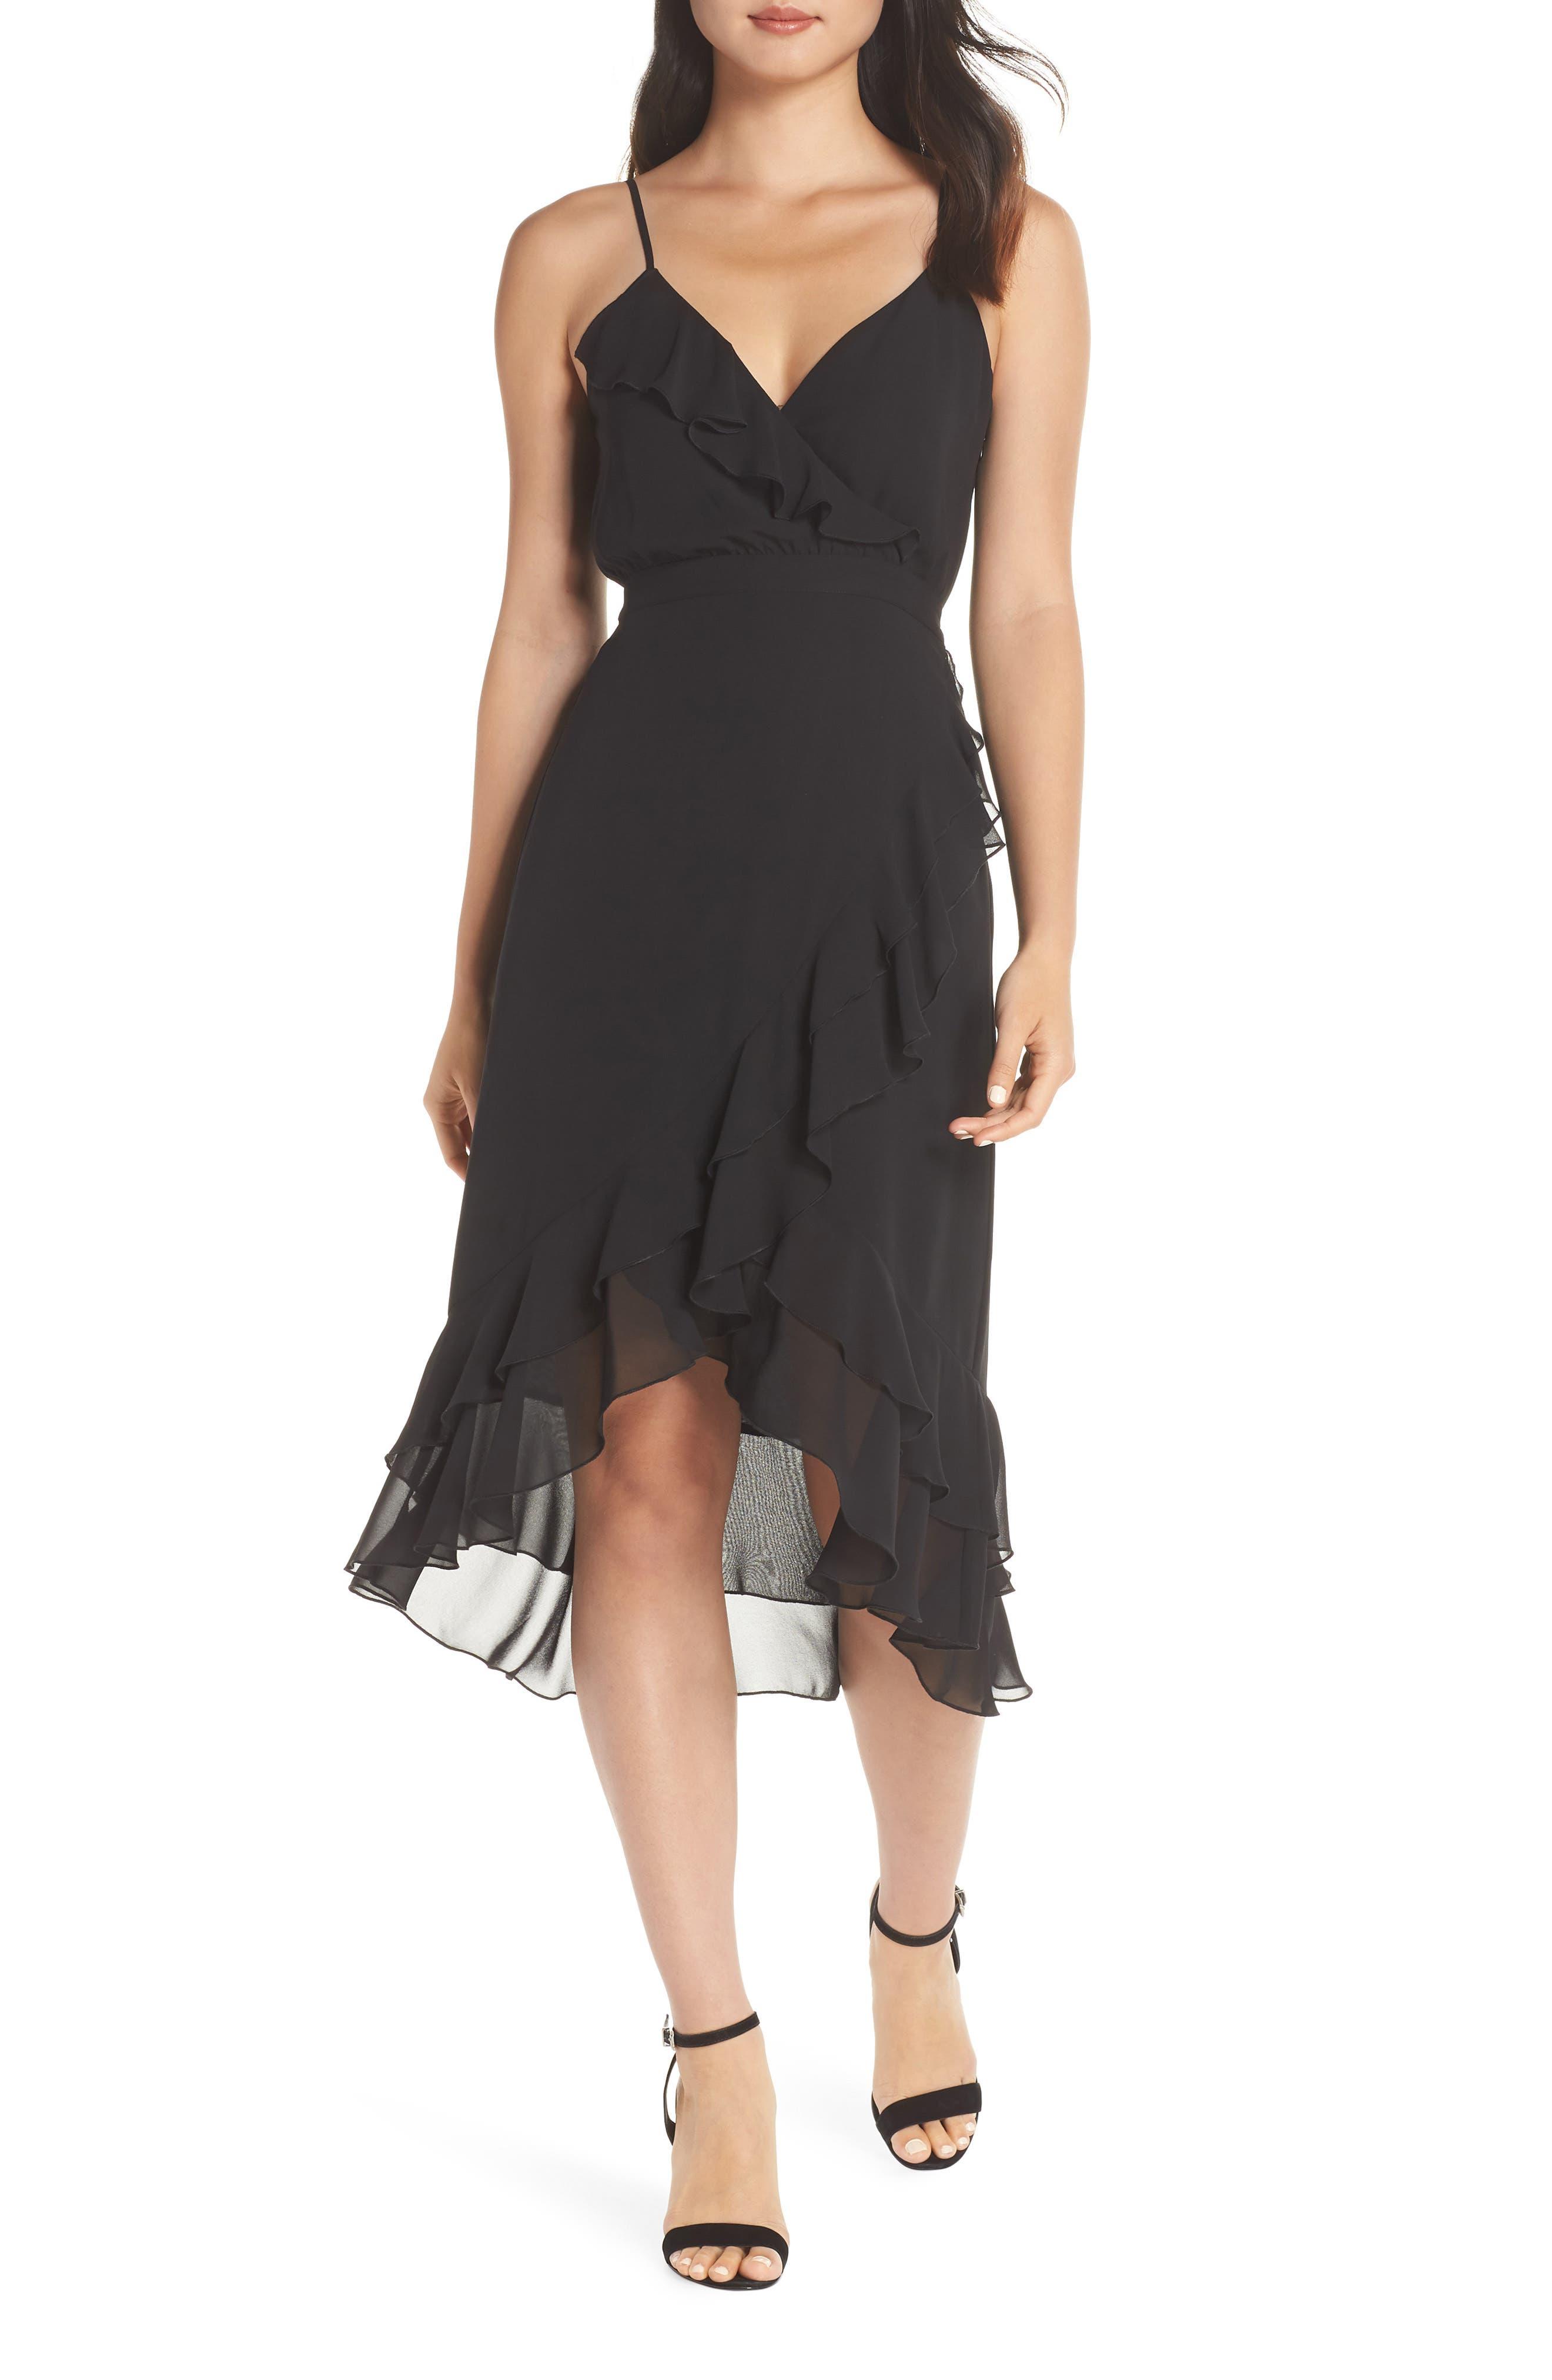 ALI & JAY Pretty Lady High/Low Dress in Black